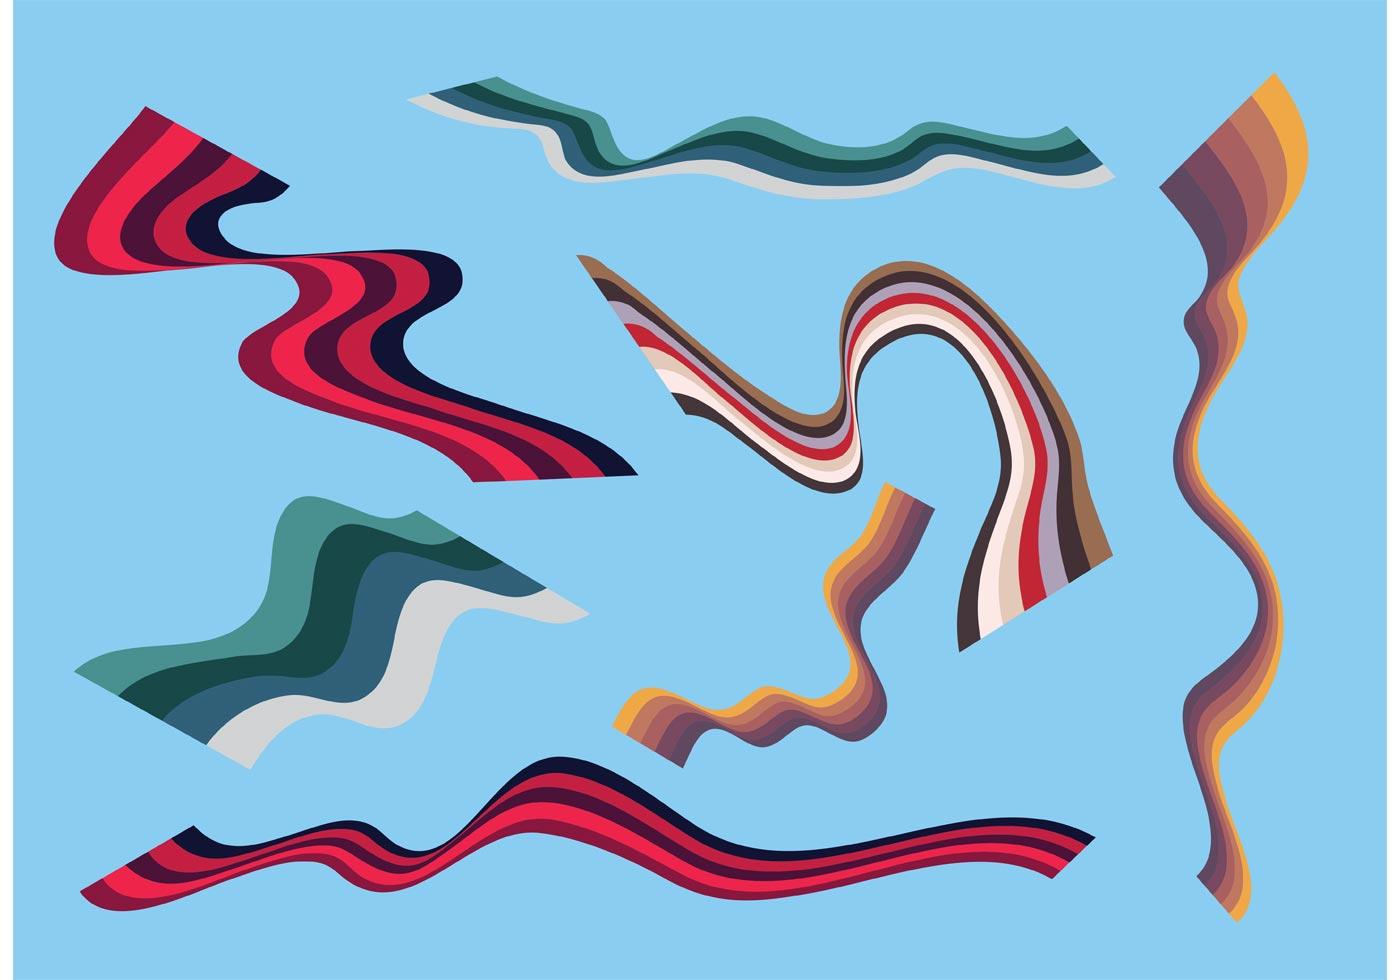 ribbon vector graphics download free vector art stock